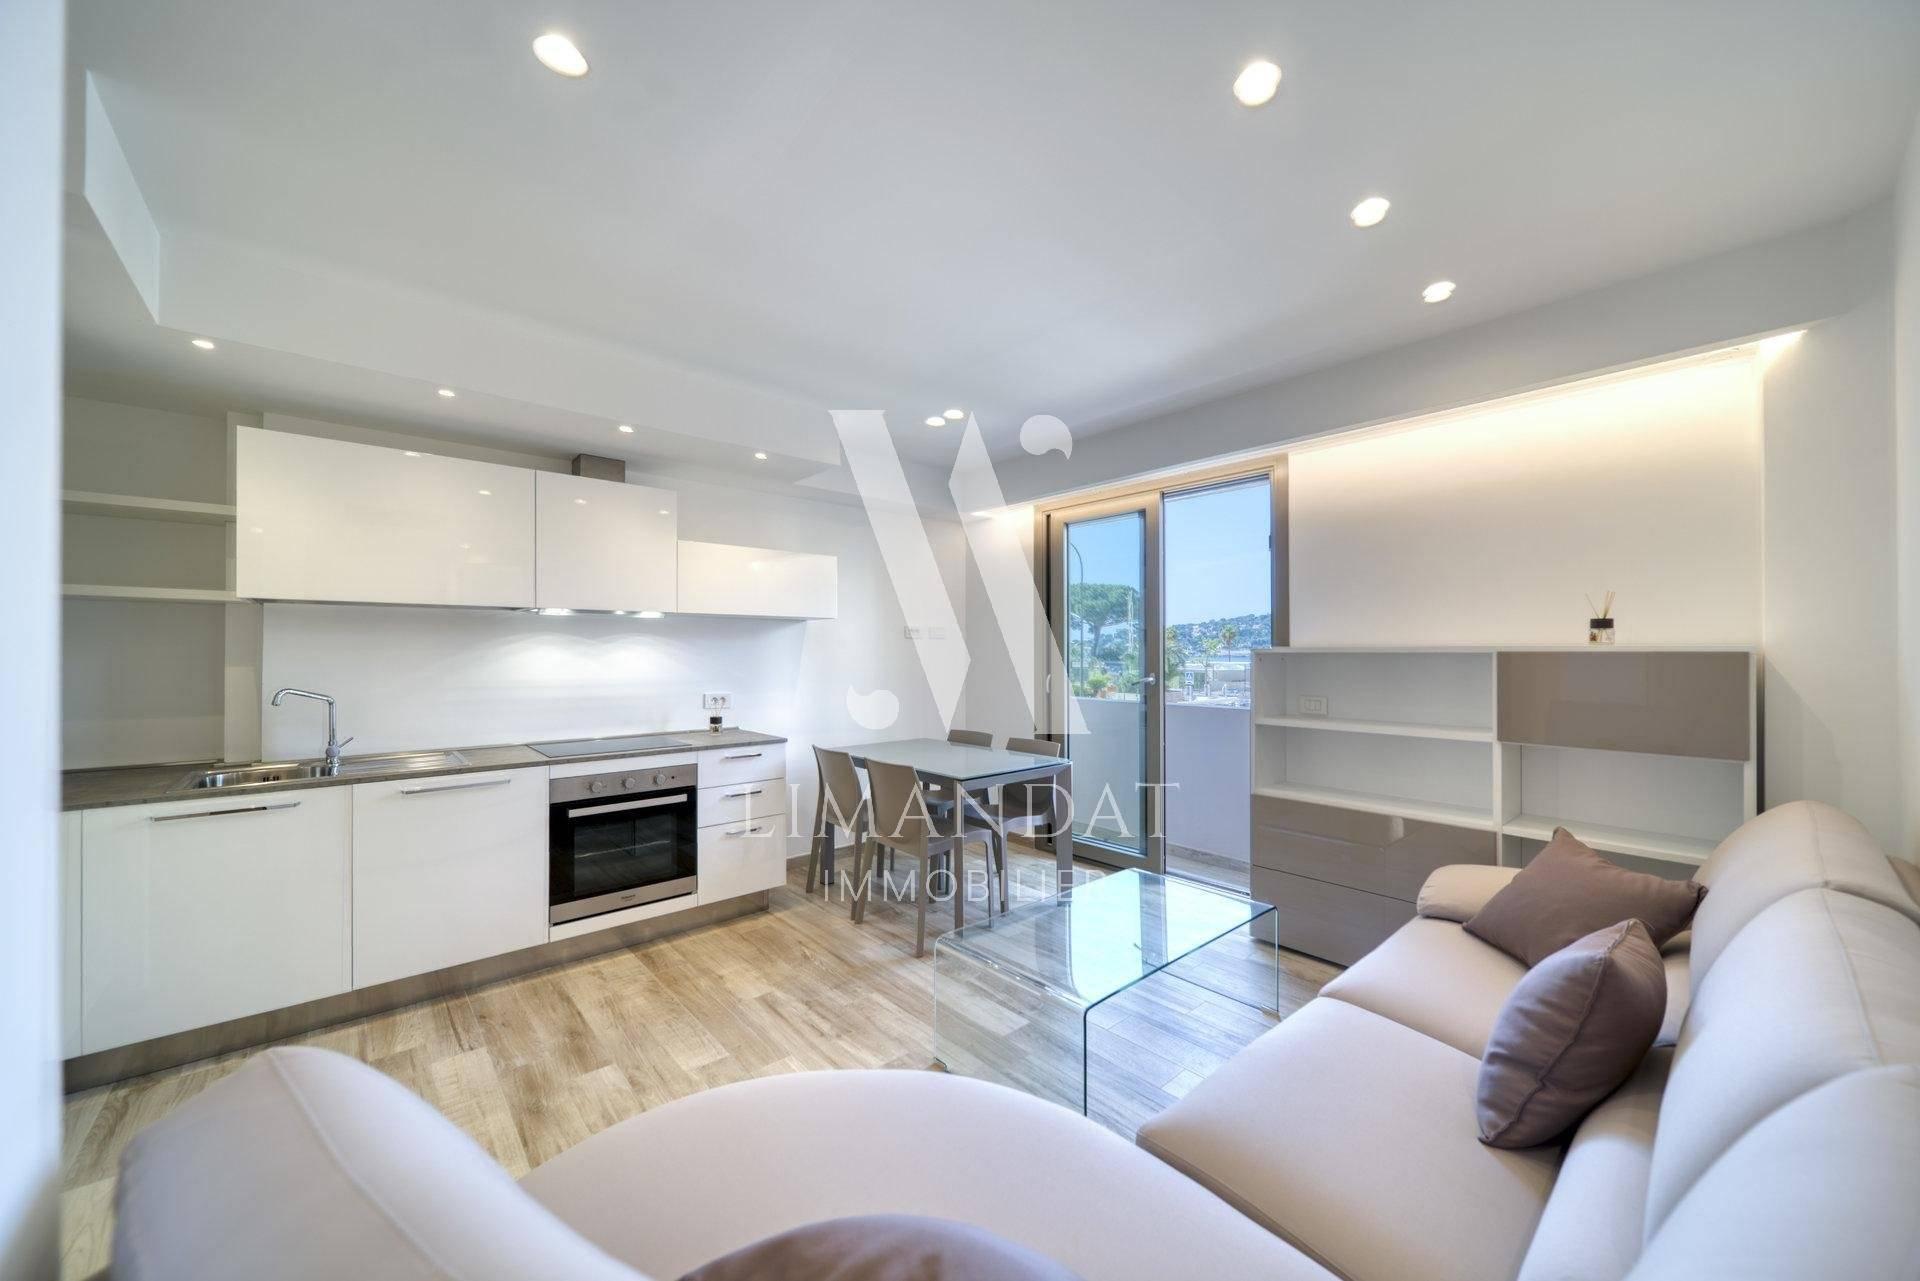 Living-room Wooden floor Stainless steel